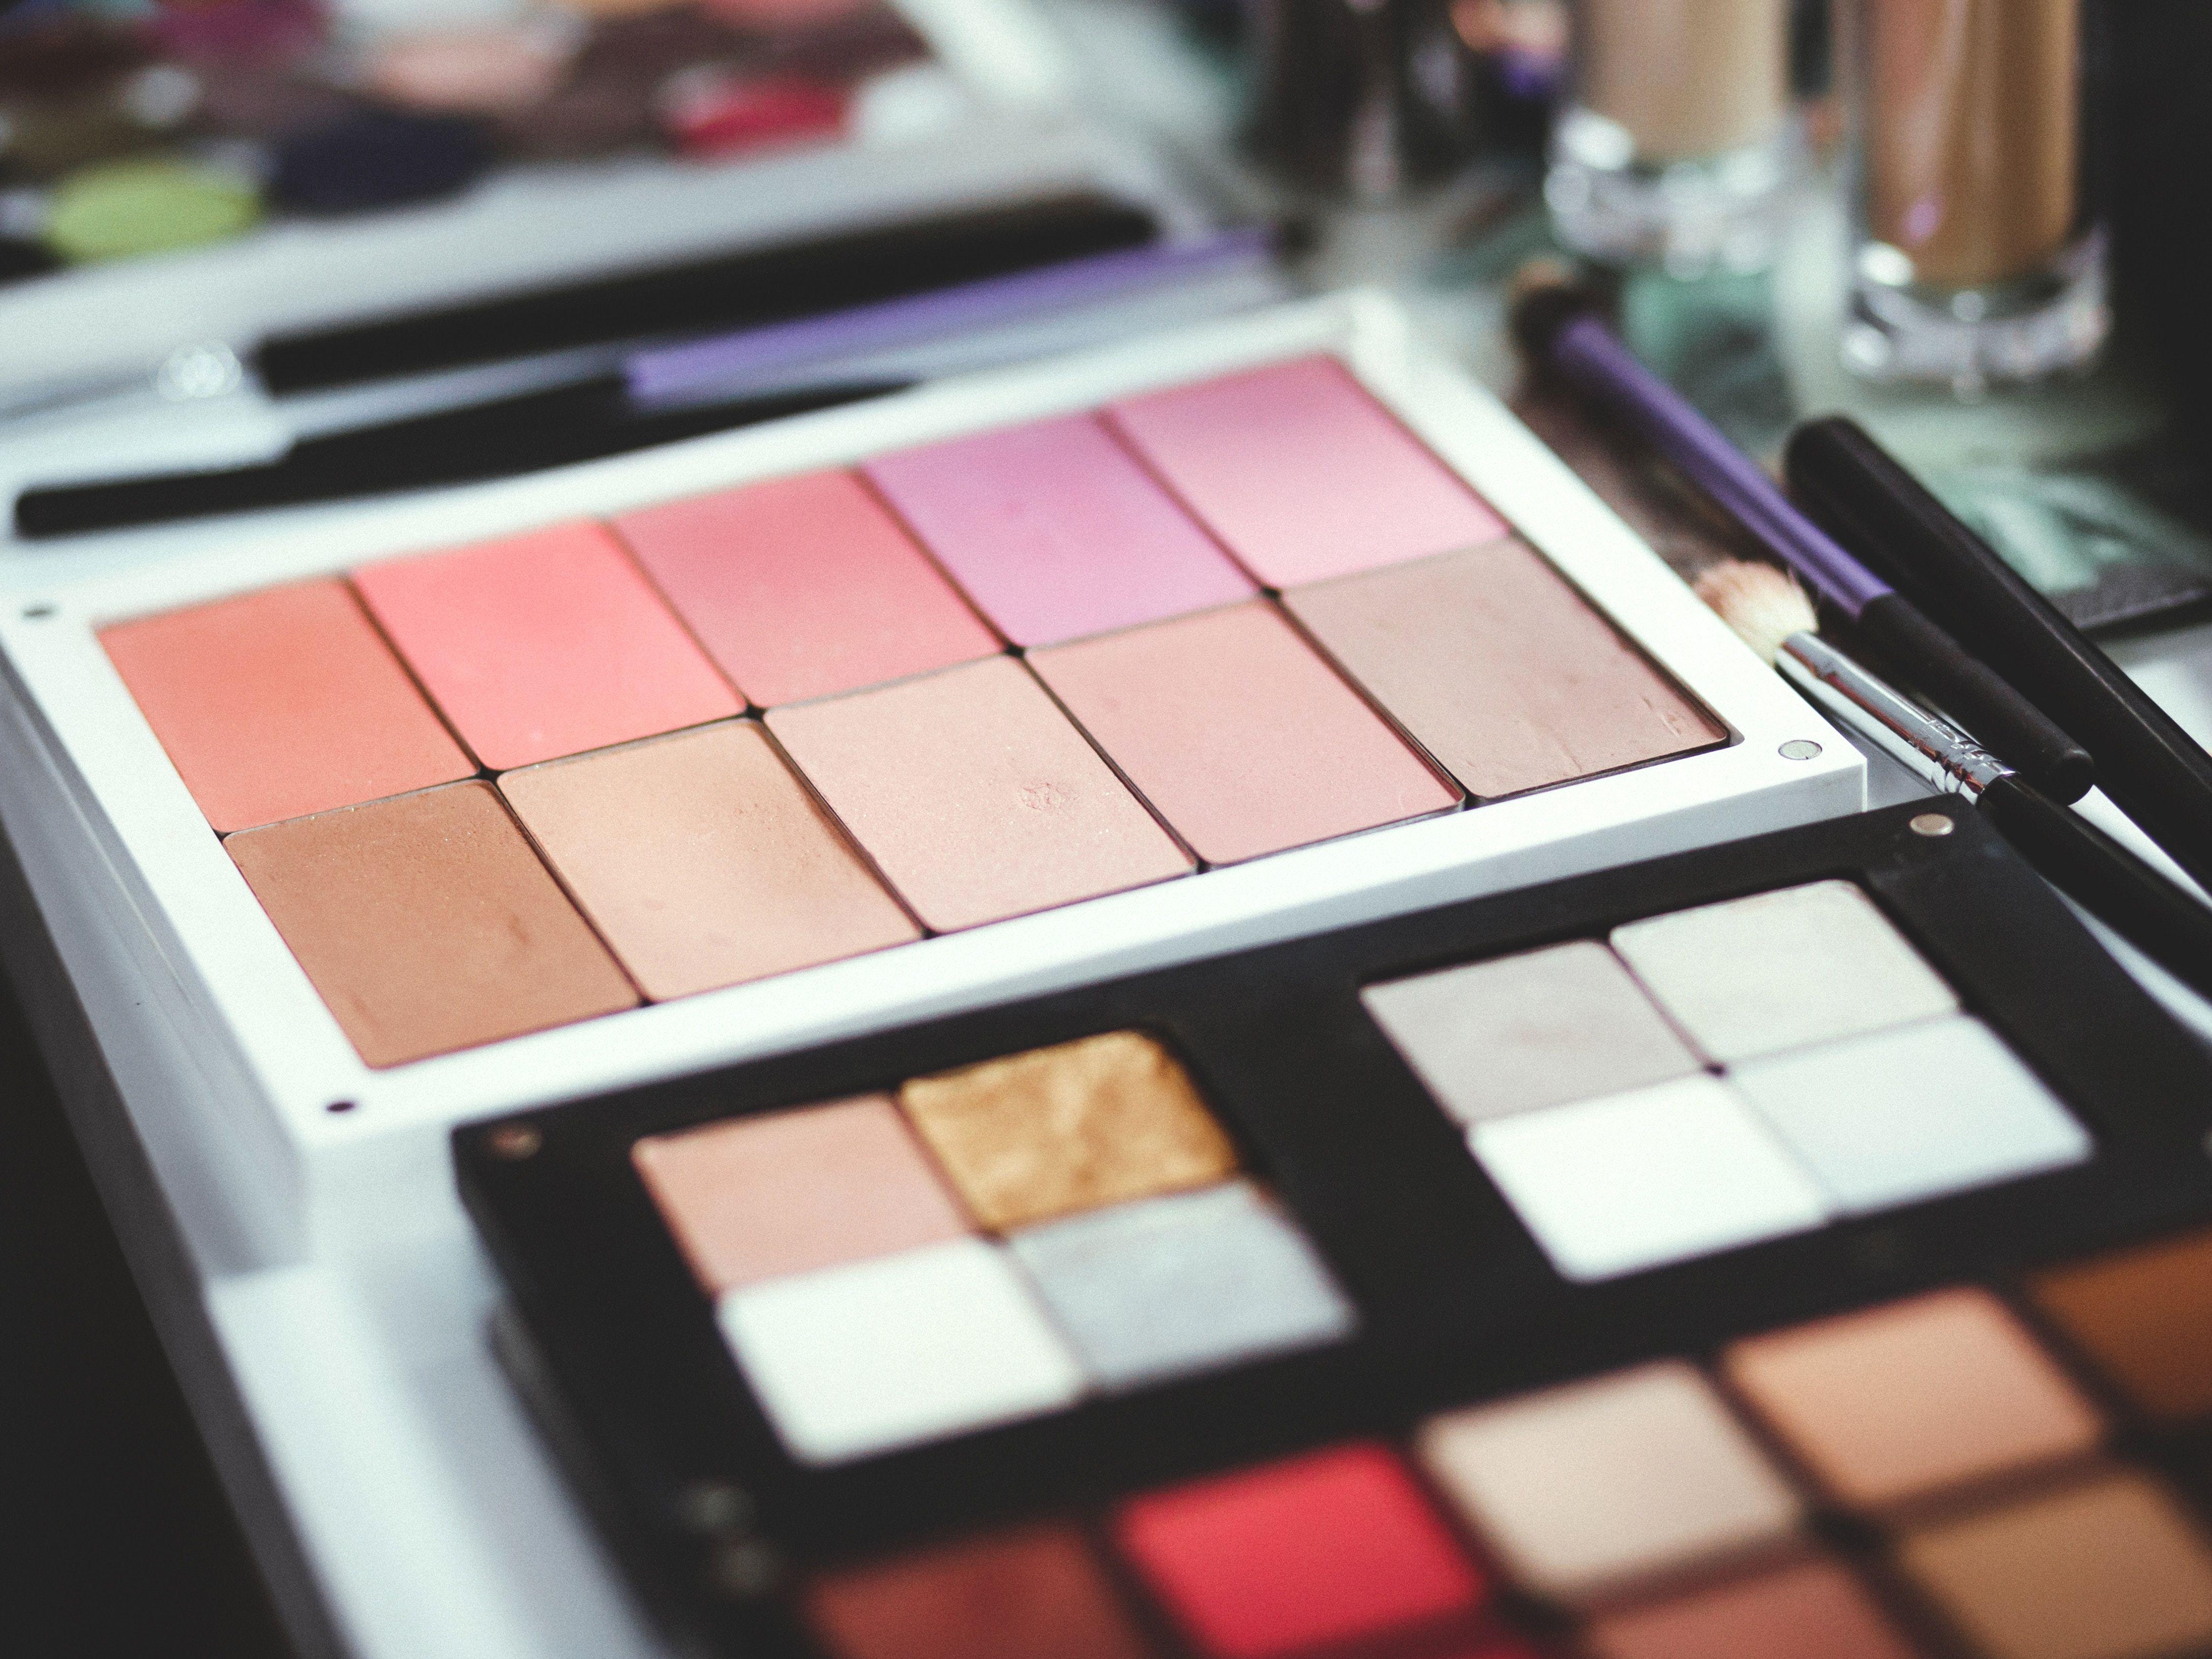 INTROD9Ww6 Introduction to Professional Makeup